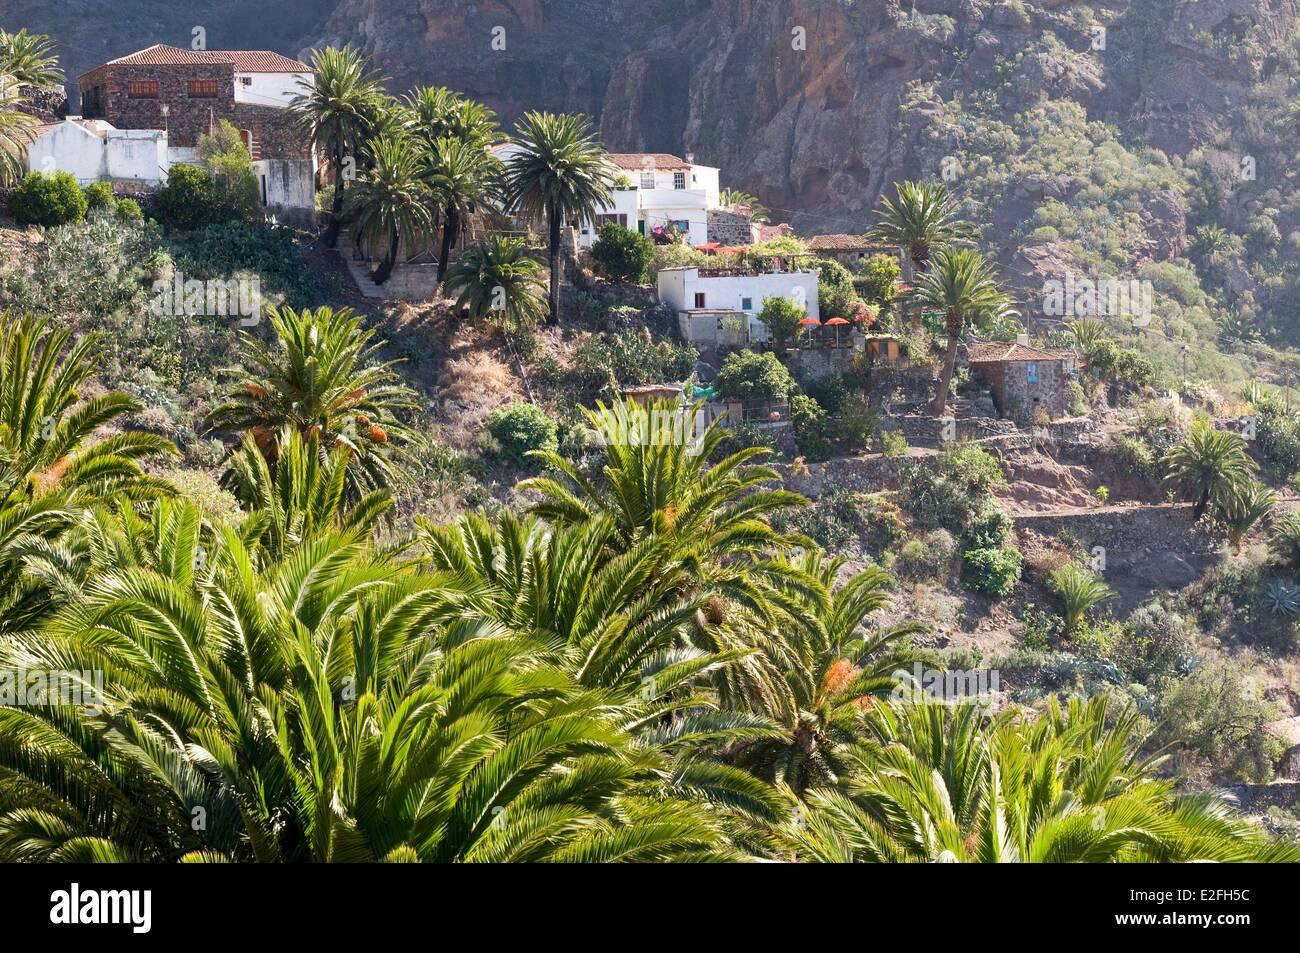 Spain, Canary Islands, Tenerife Island, Parque Rural de Teno, small village of Masca Stock Photo